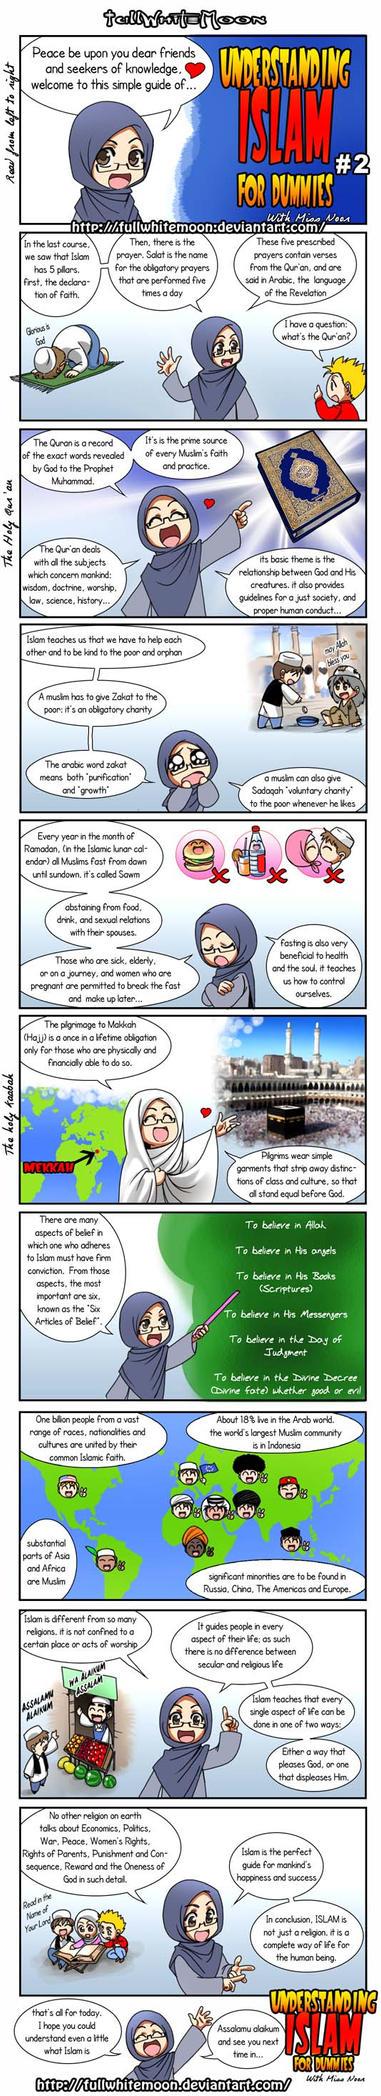 Understanding Islam 4 dummies2 by FullWhiteMoon